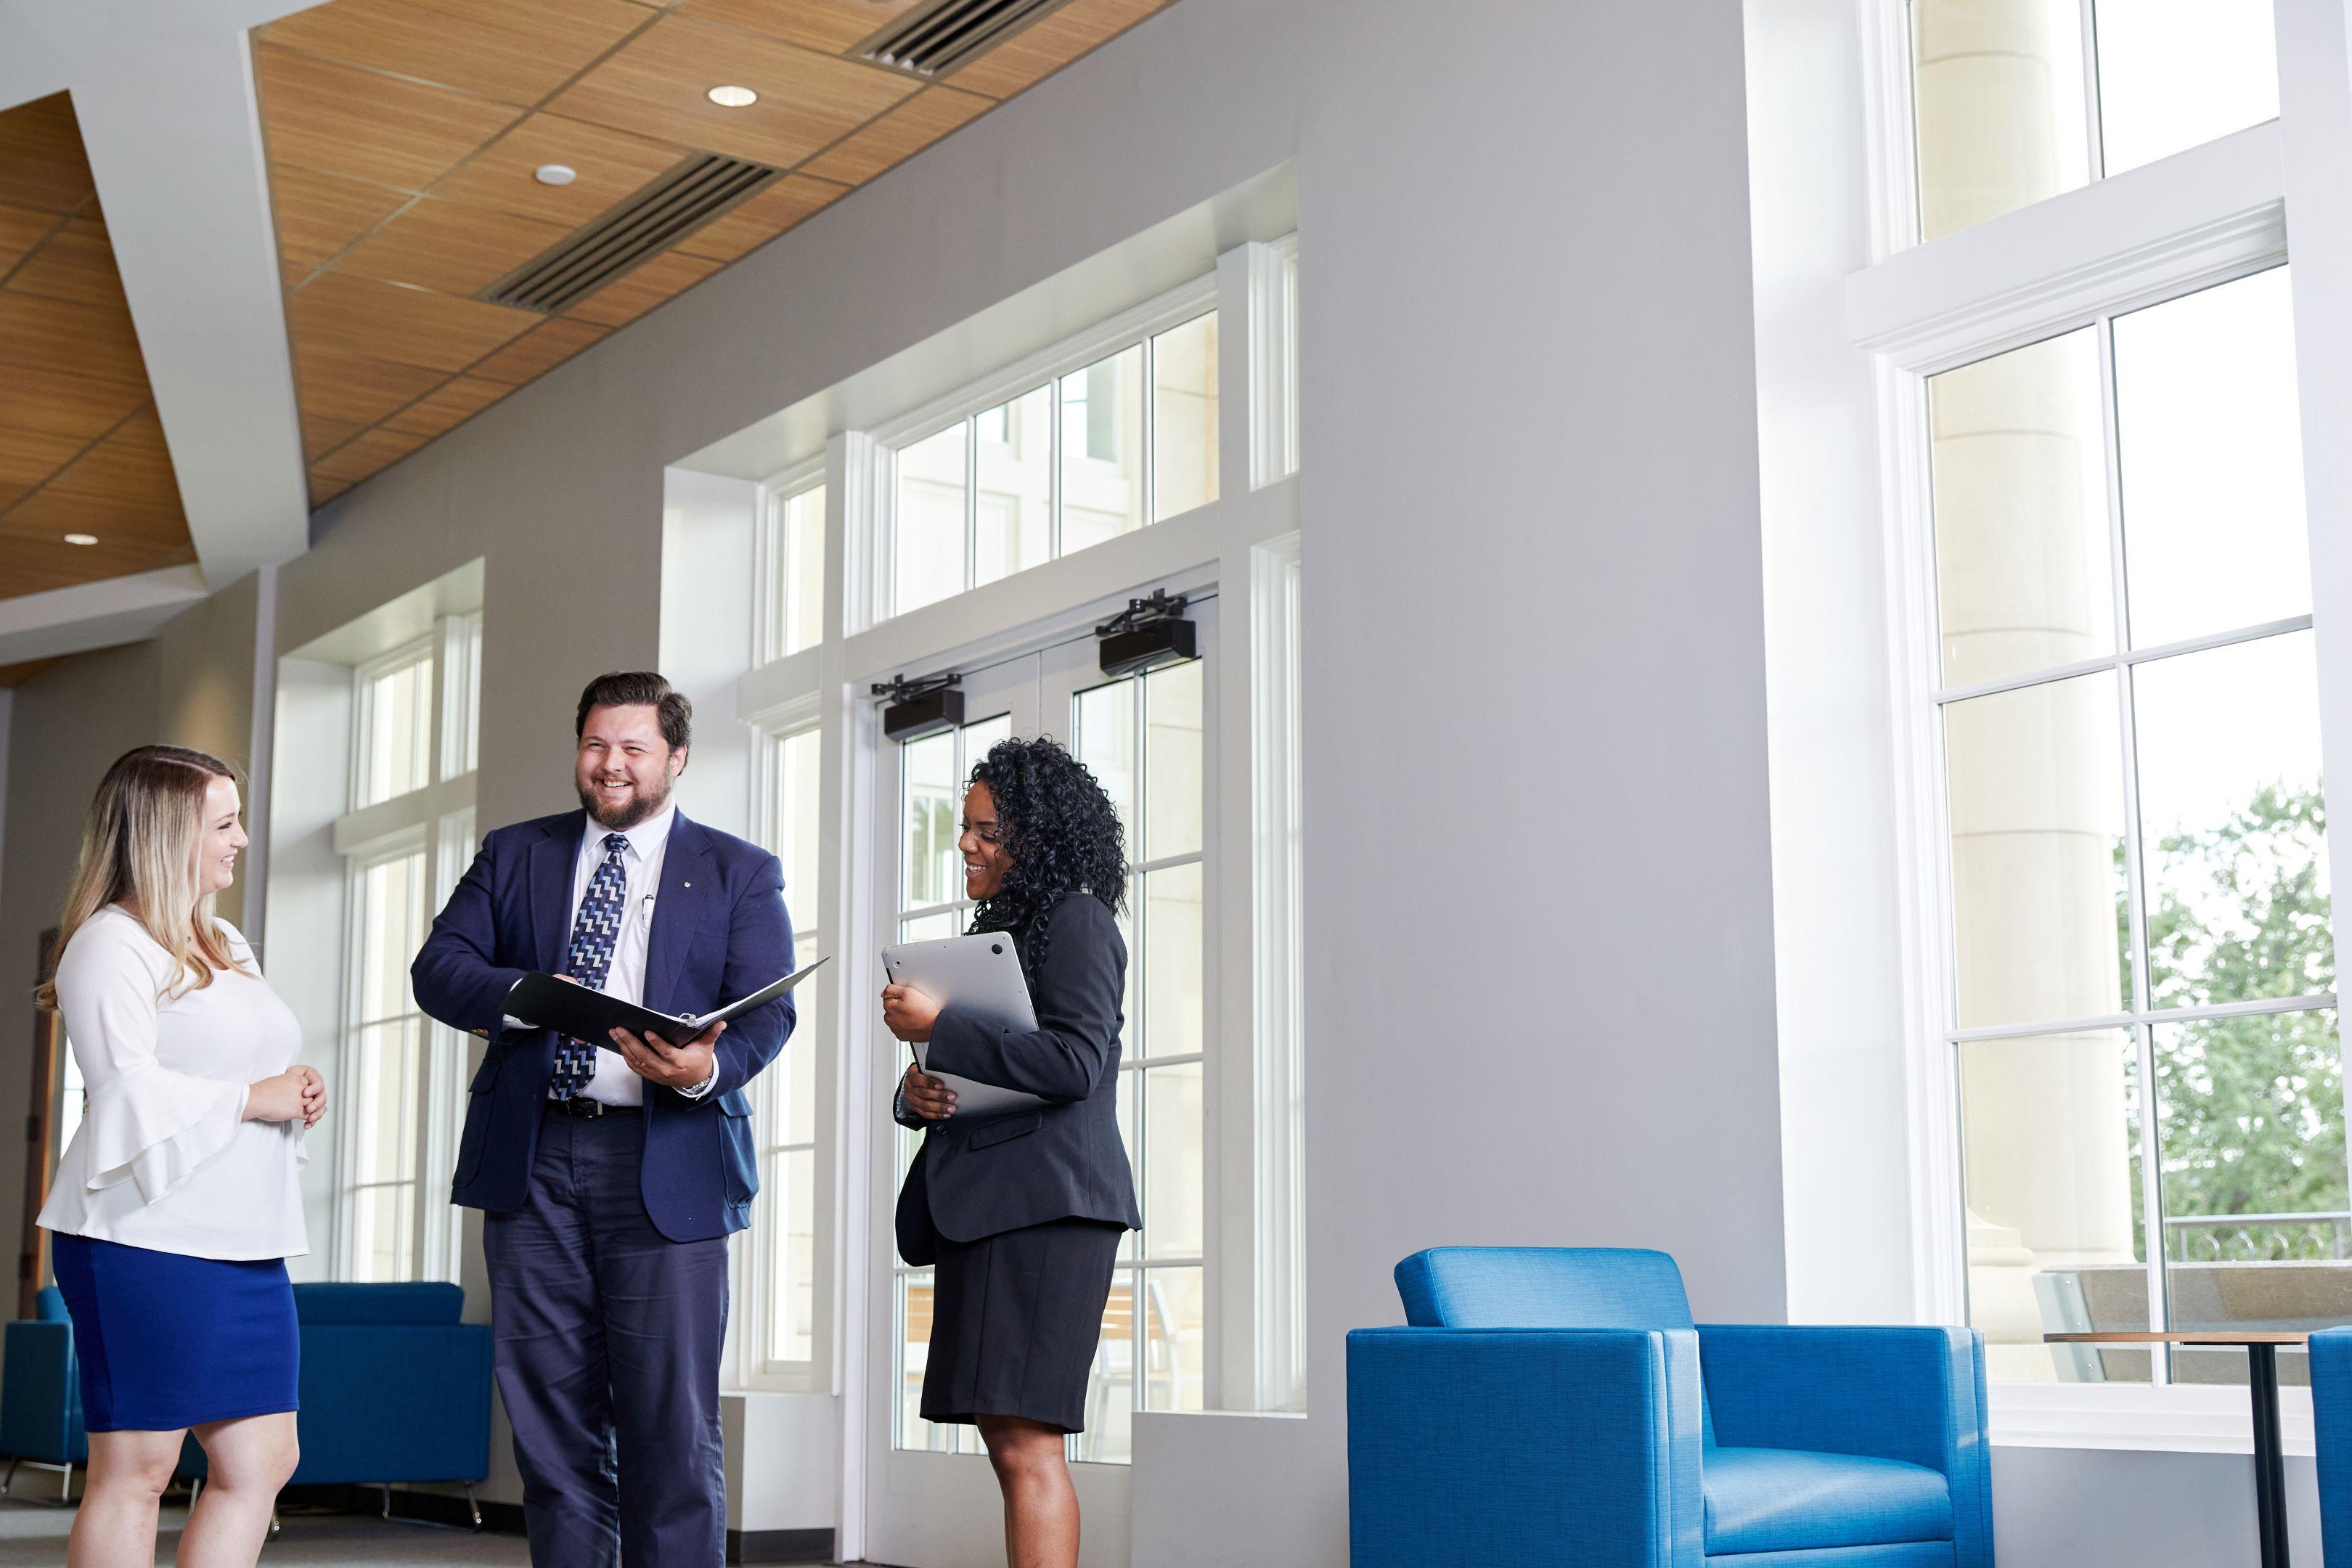 Online DBA Hospitality Management